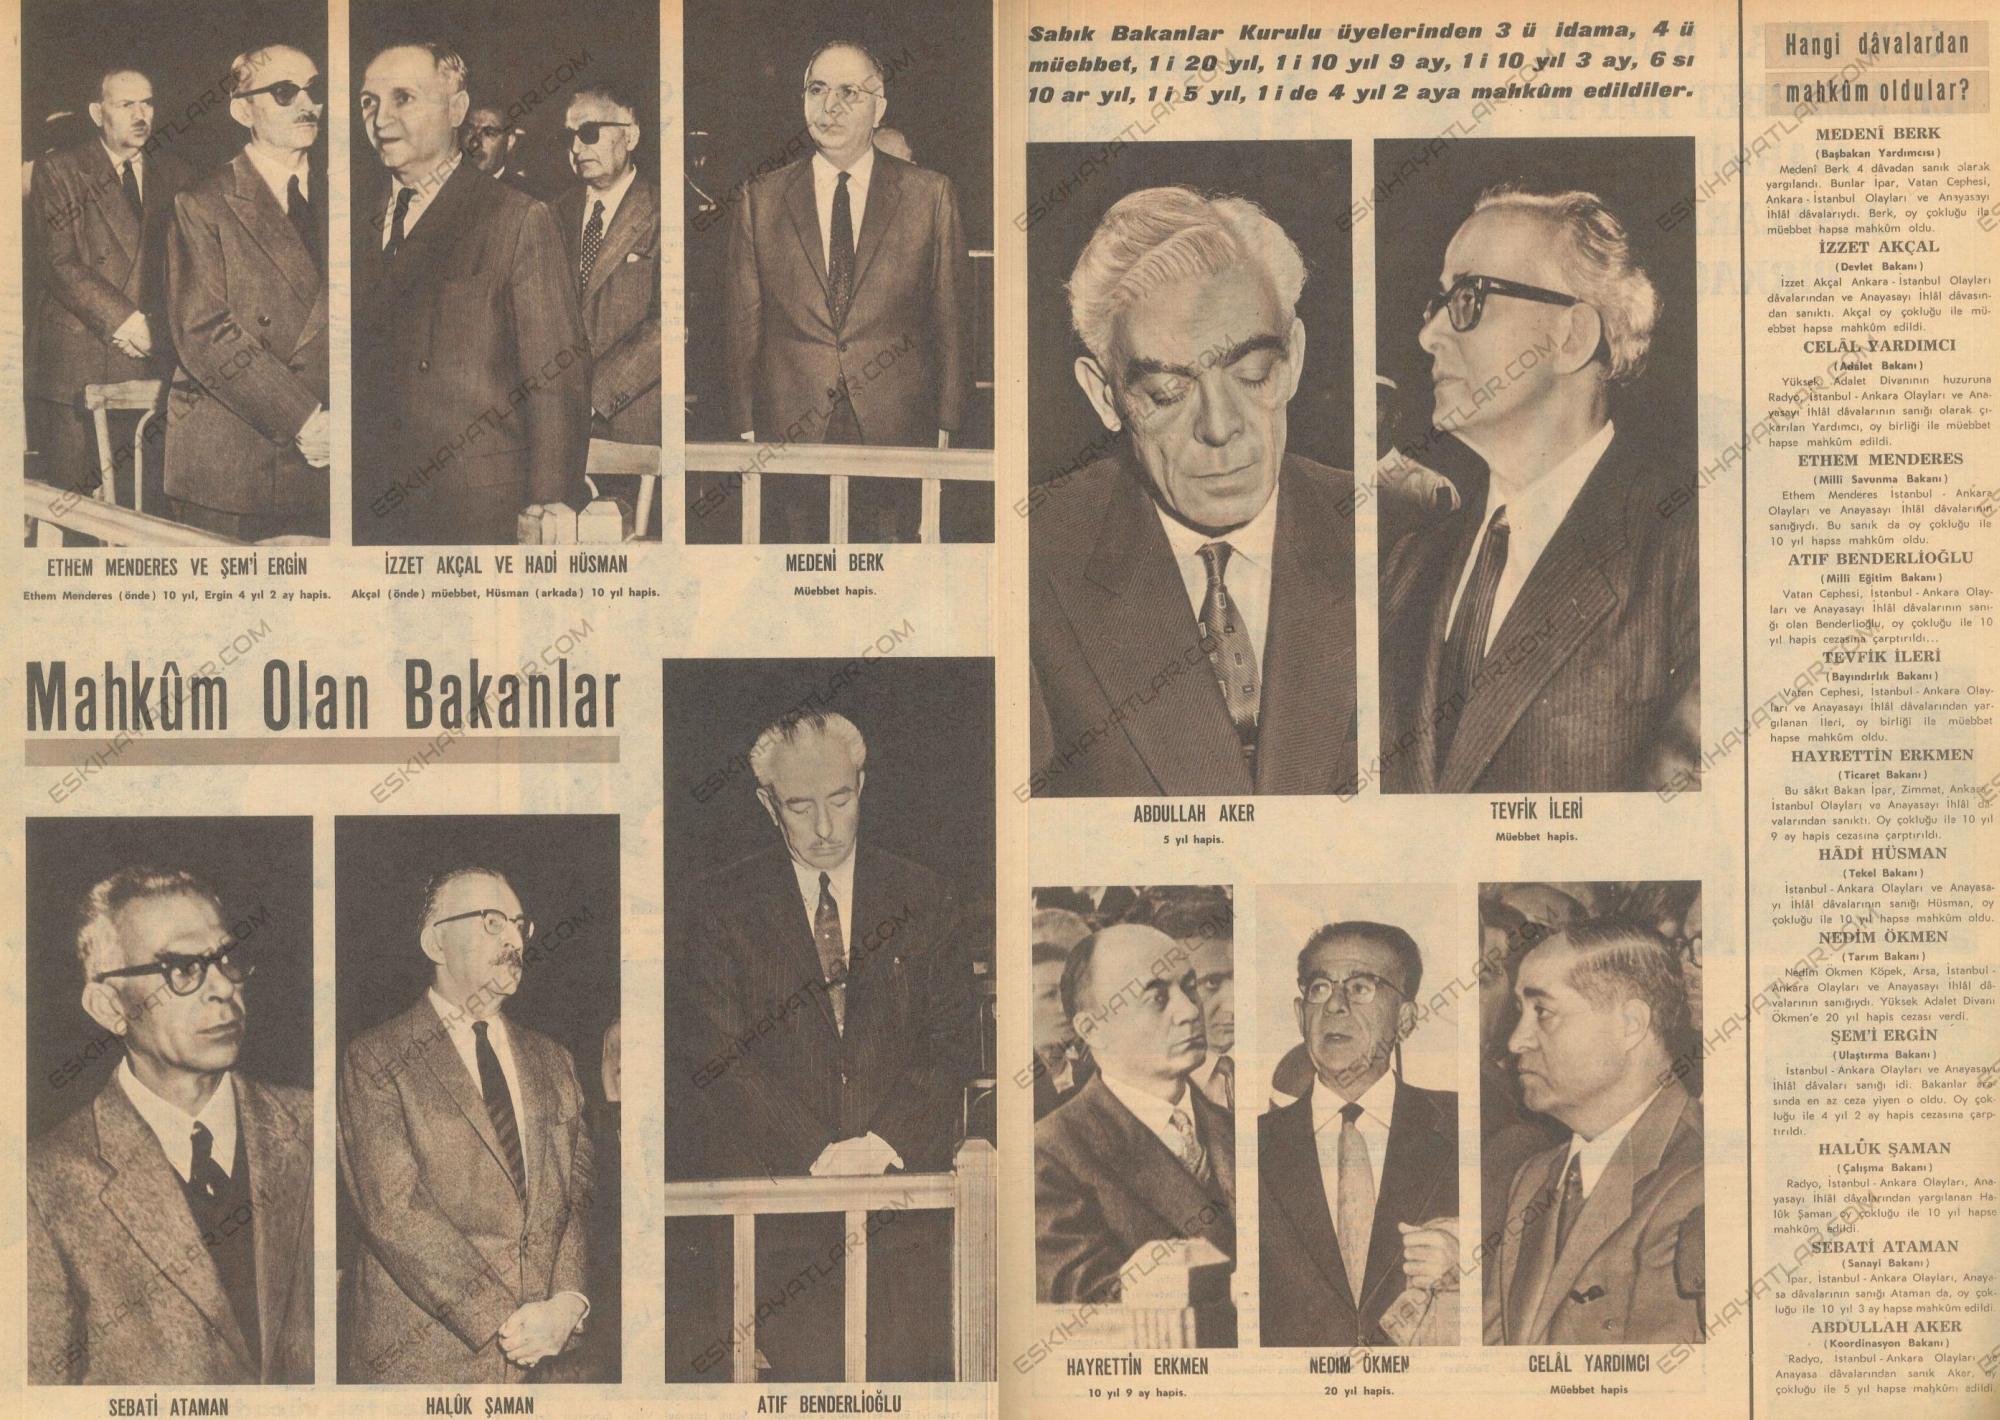 1960-ihtilali-idam-edilenler-adnan-menderes-hasan-polatkan-fatin-rustu-zorlu-yassiada-tutanaklari-1961-hayat-dergisi-arsivleri (21)